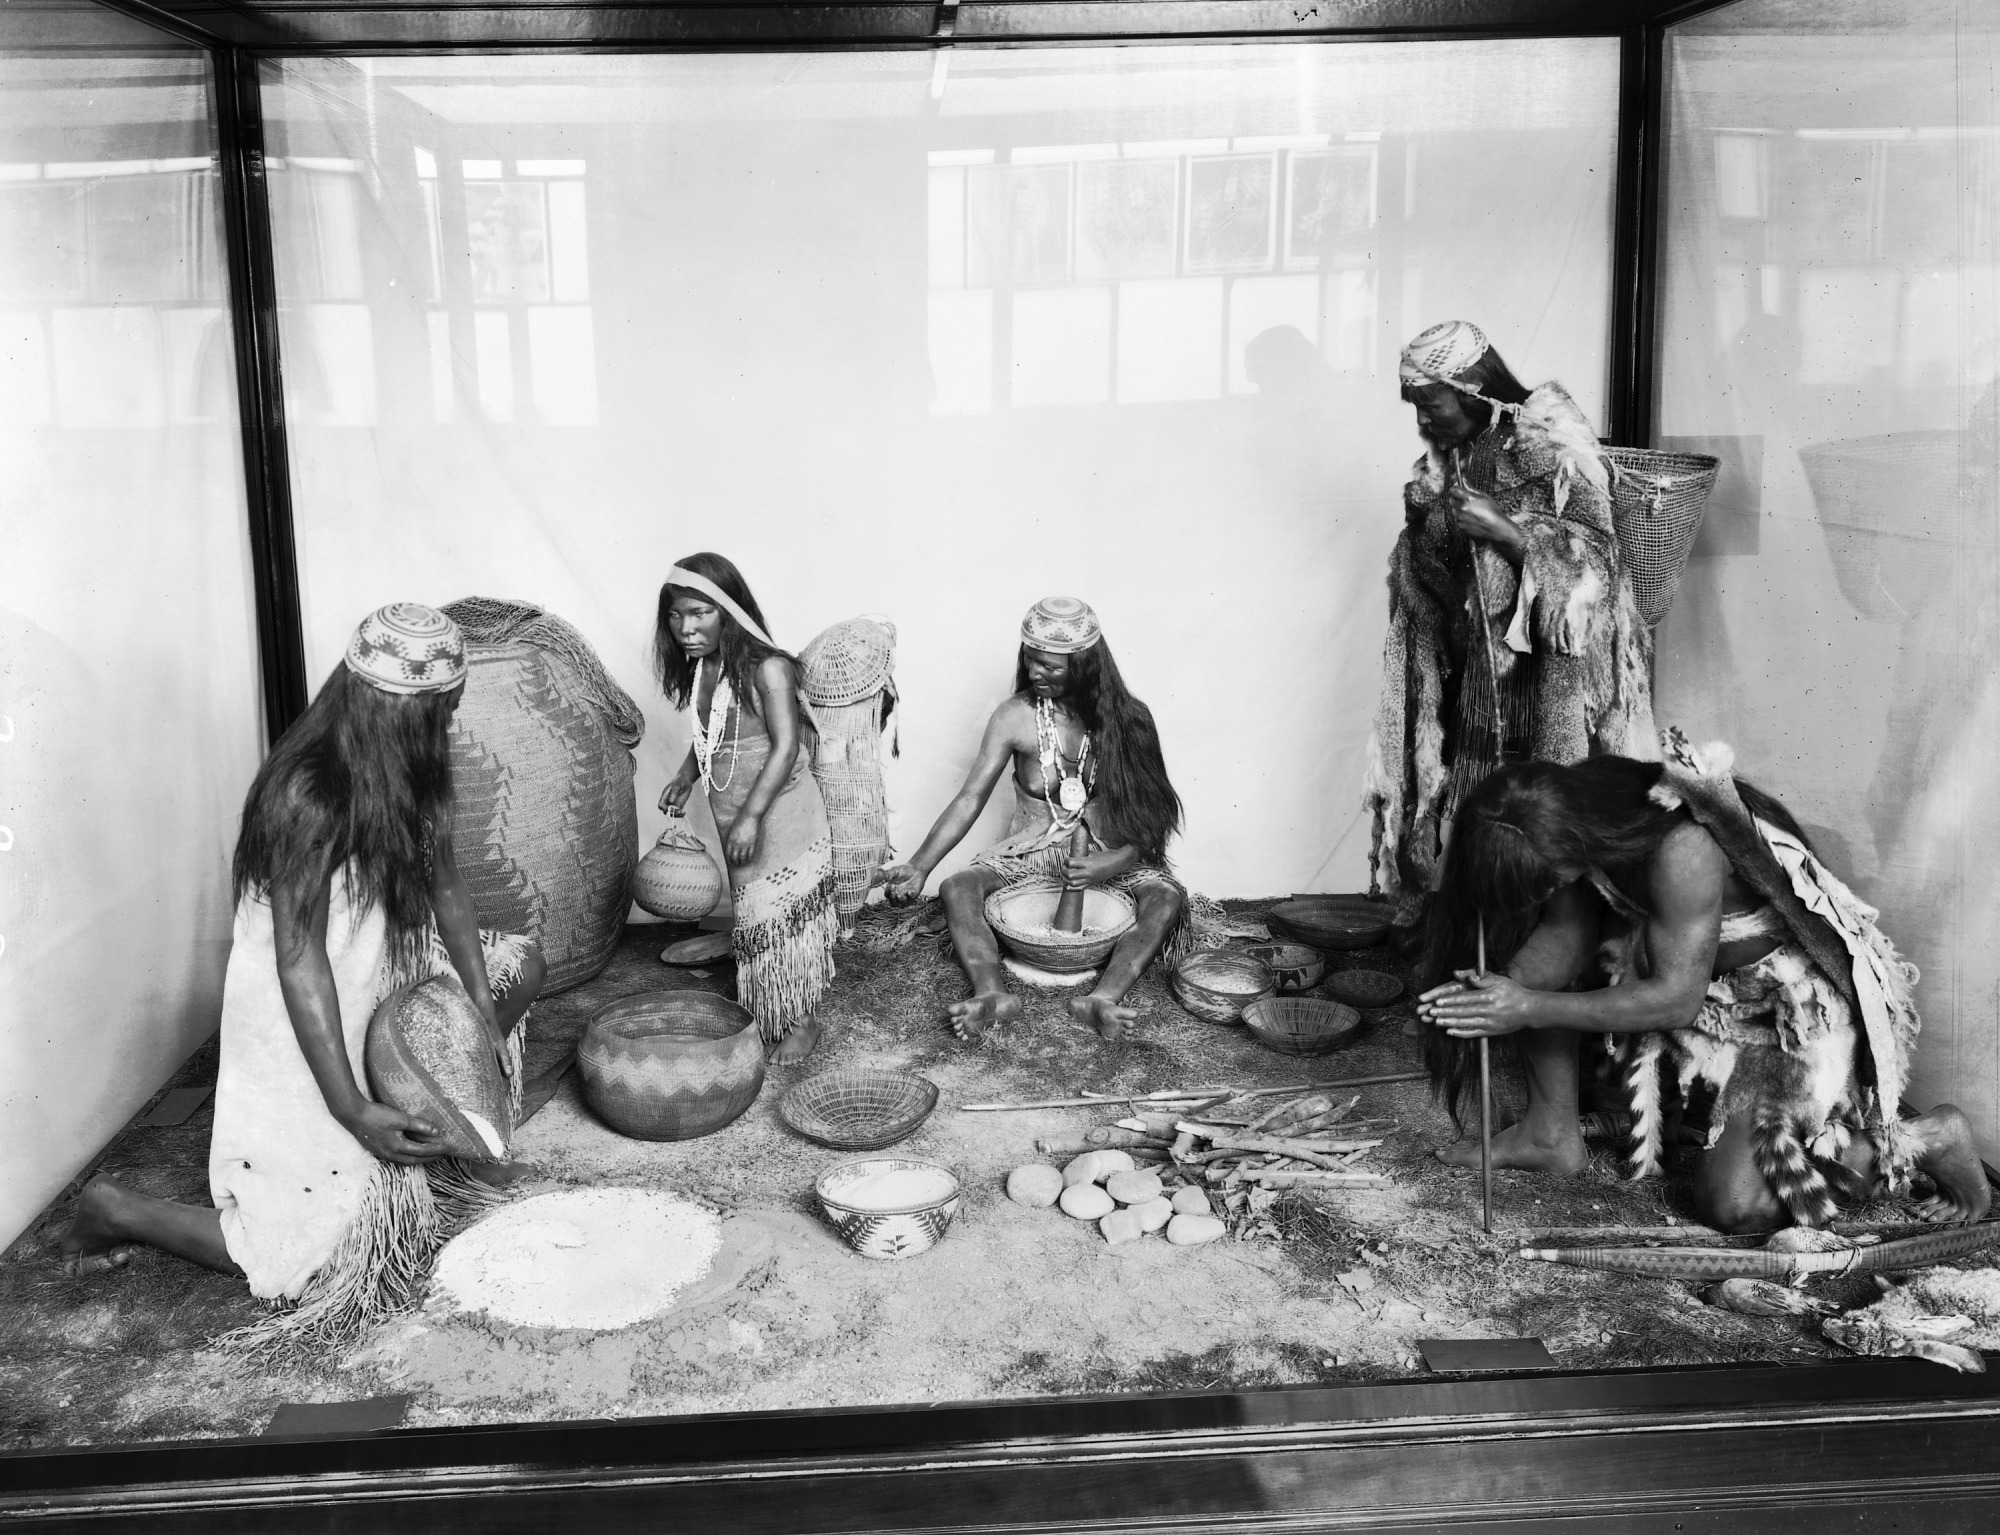 Hupa Indians Anthropology Exhibit, U.S. National Museum